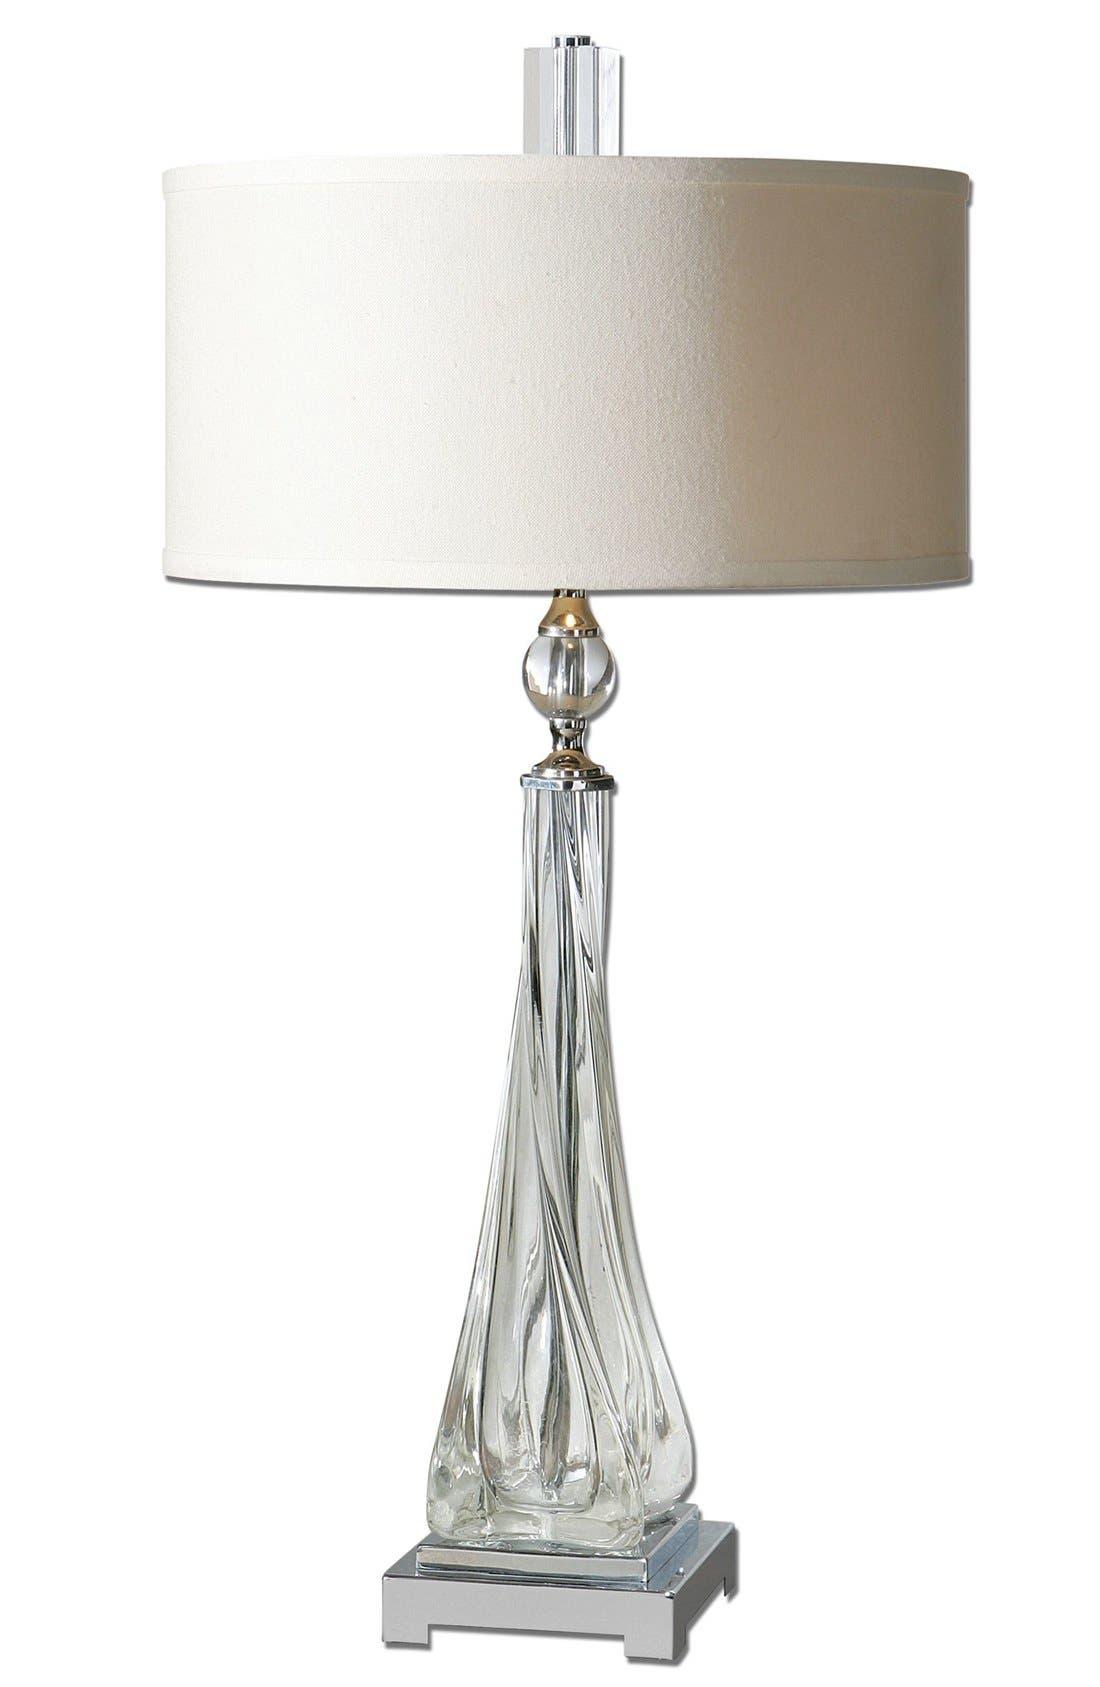 'Grancona' Glass Table Lamp,                             Main thumbnail 1, color,                             100